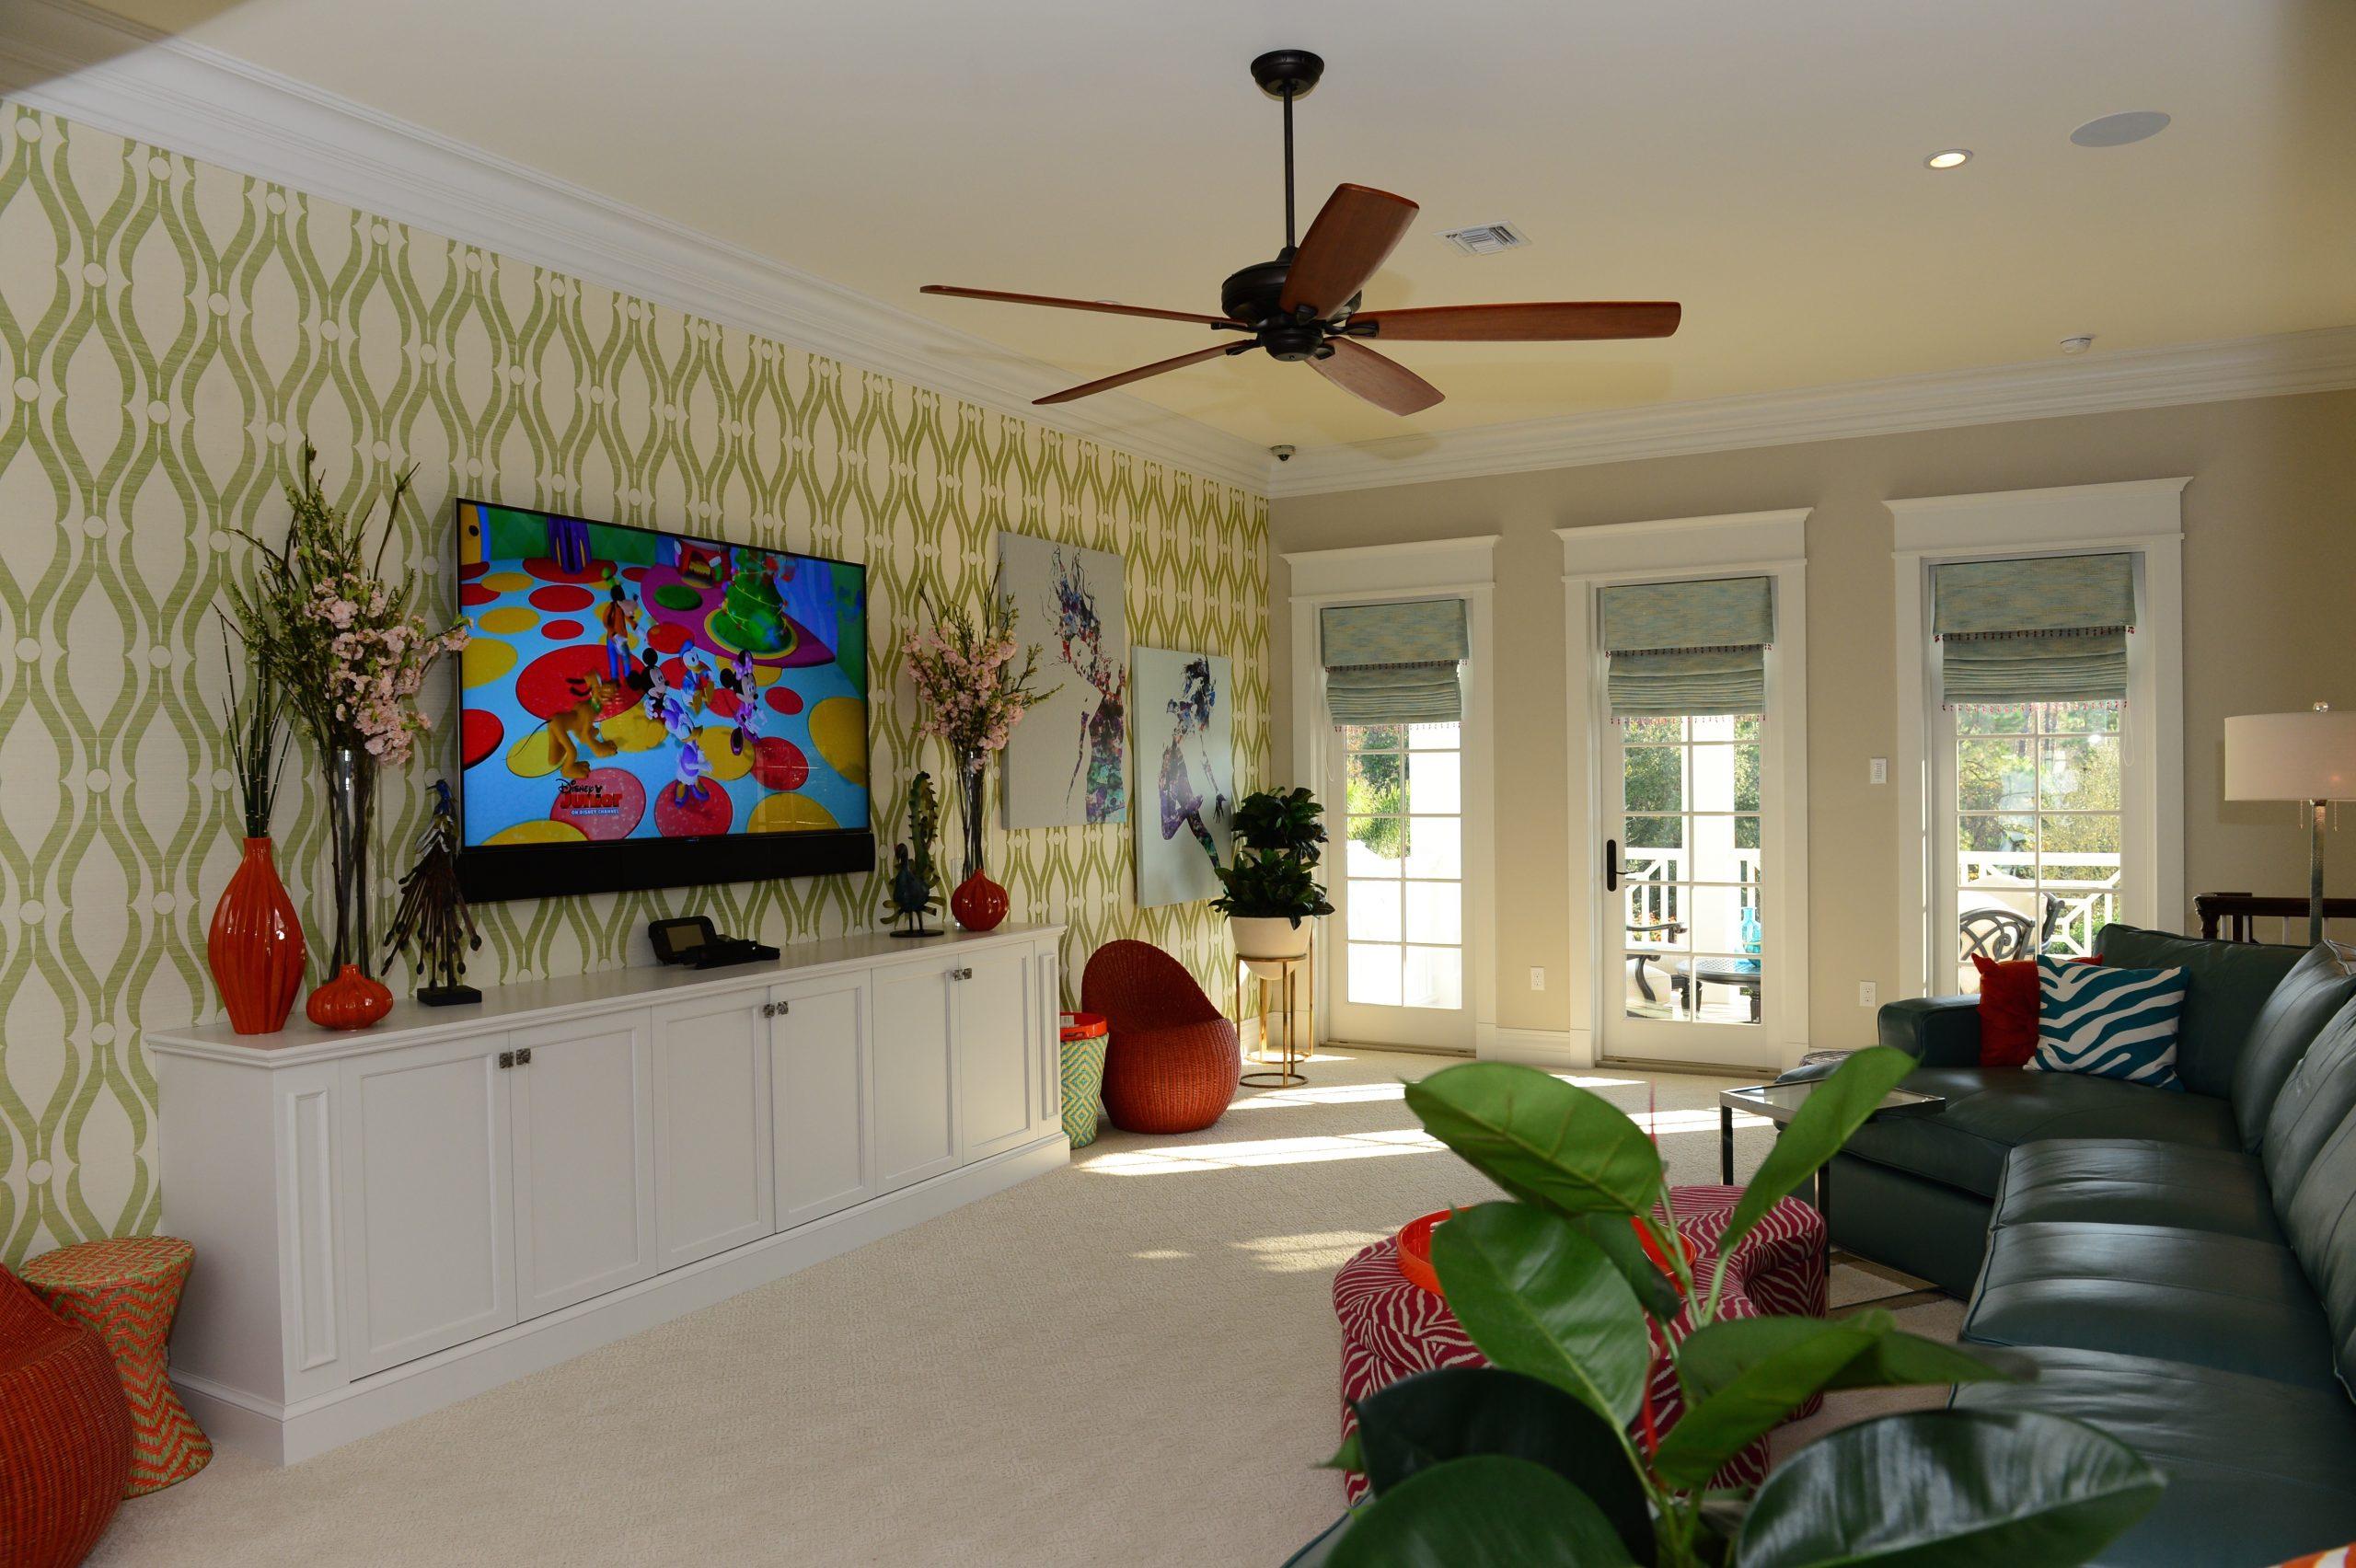 Lot 63 Bedroom-Green